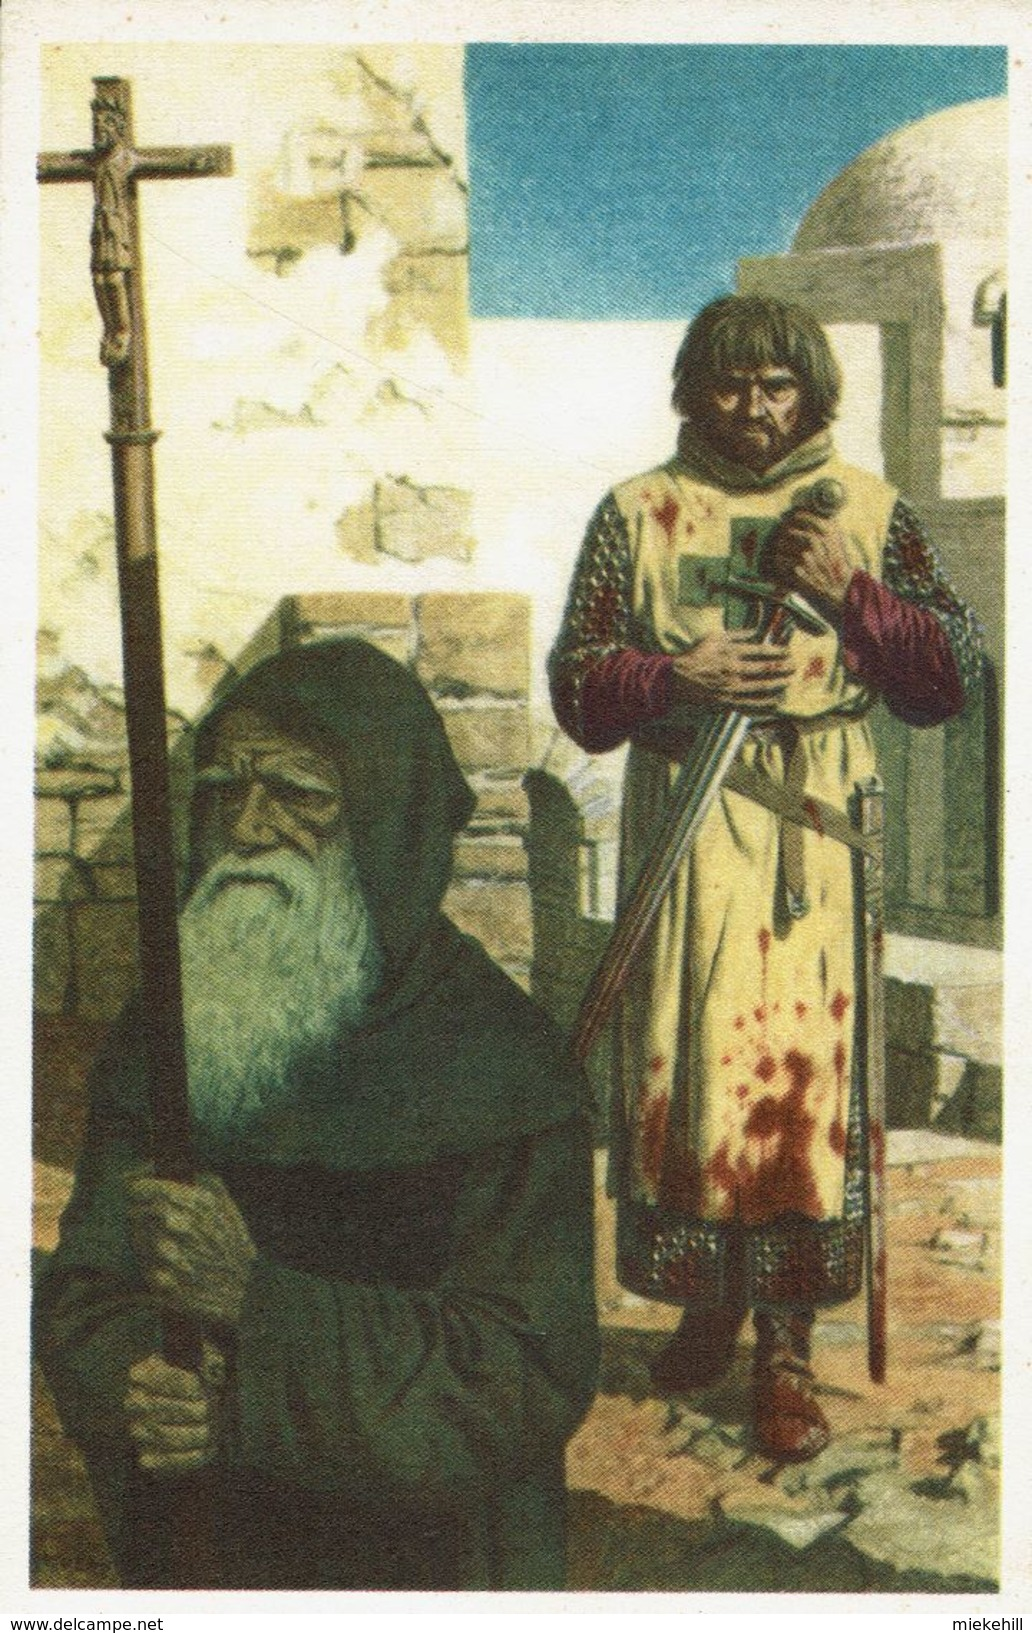 CROISADE-ROBERT DE JERUSALEM COMTE DE FLANDRE-religion-ILLUSTRATEUR HUENS- - Histoire